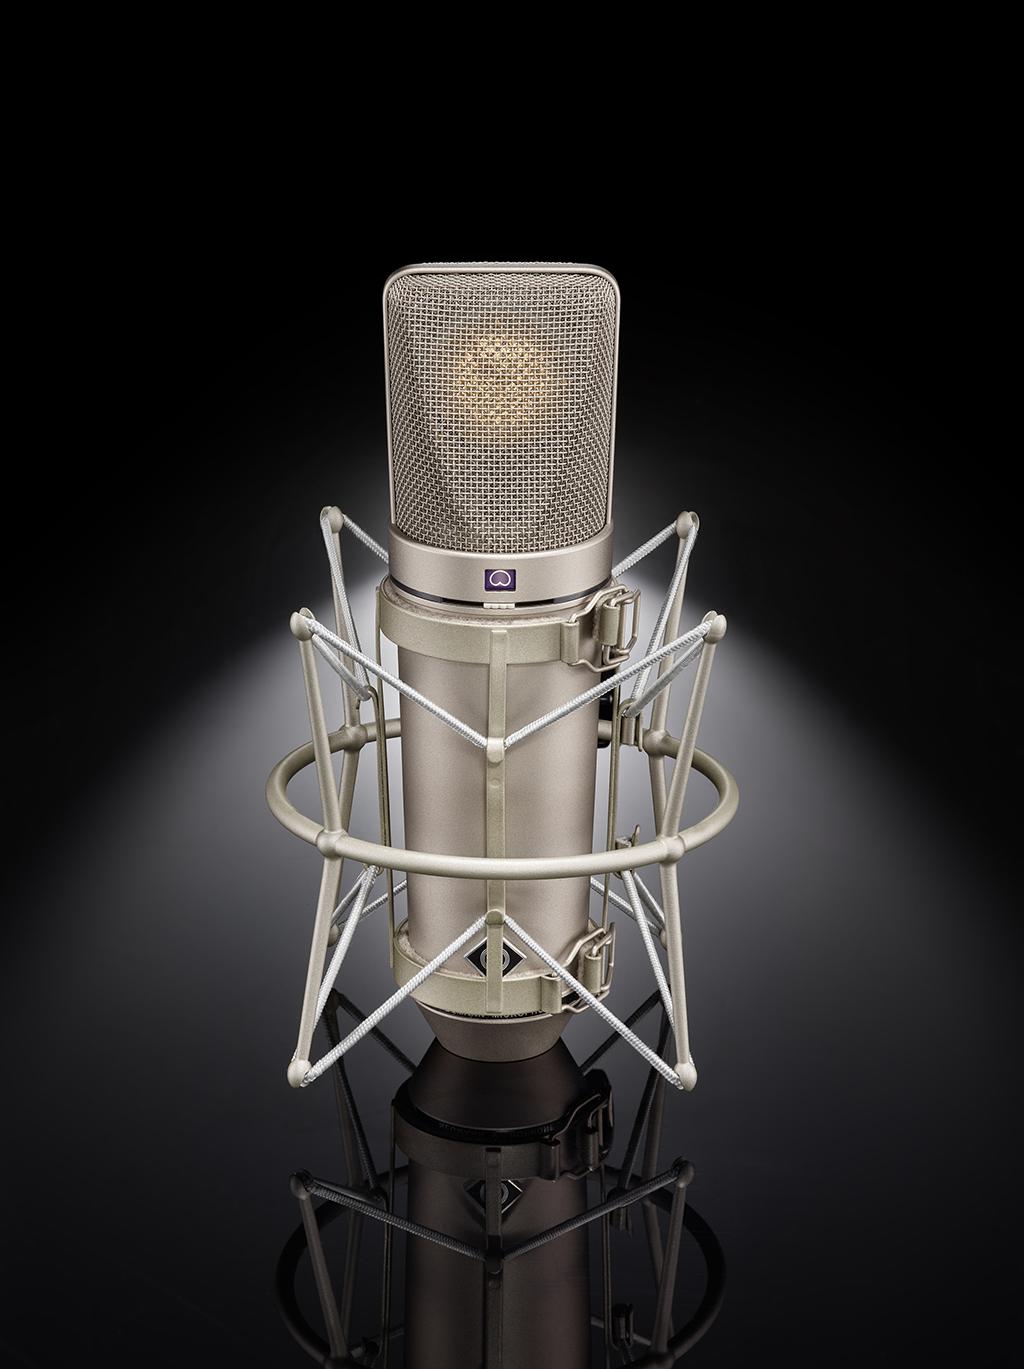 NAMM Show: Neumann legt das Röhrenmikrofon U 67 neu auf